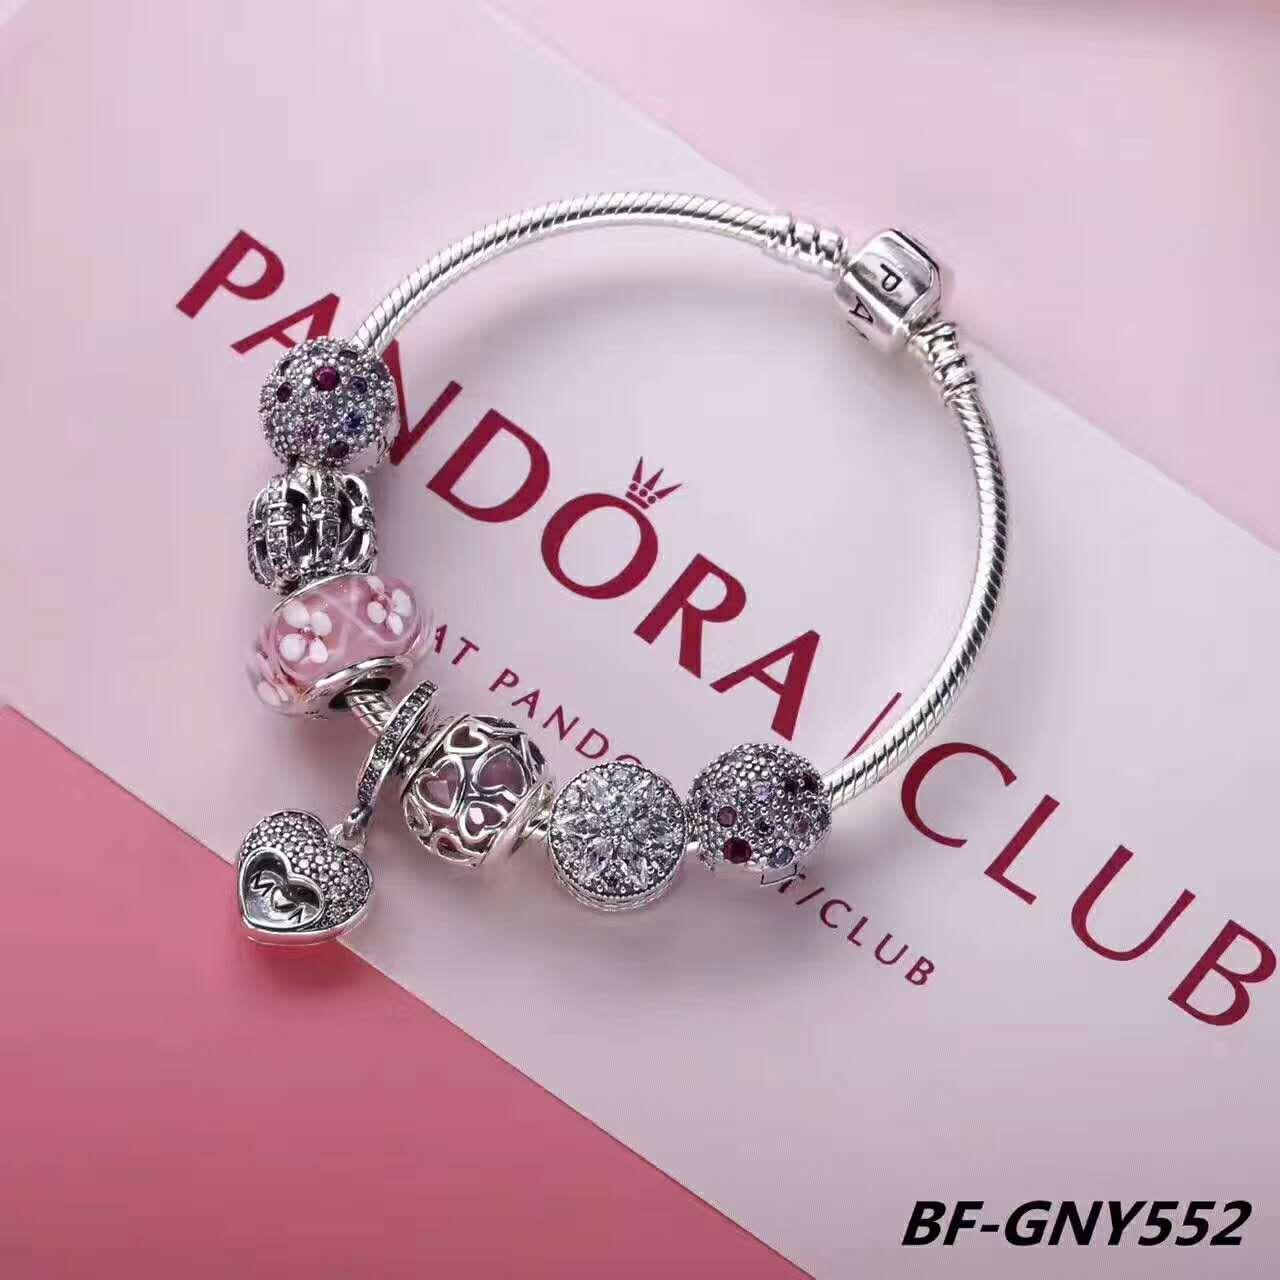 Pandora Jewelry Jobs October 2018 Complete Pandora Online Training Modules Sovremennye Kolca P Pandora Jewelry Box Pandora Charms Pandora Charm Bracelet